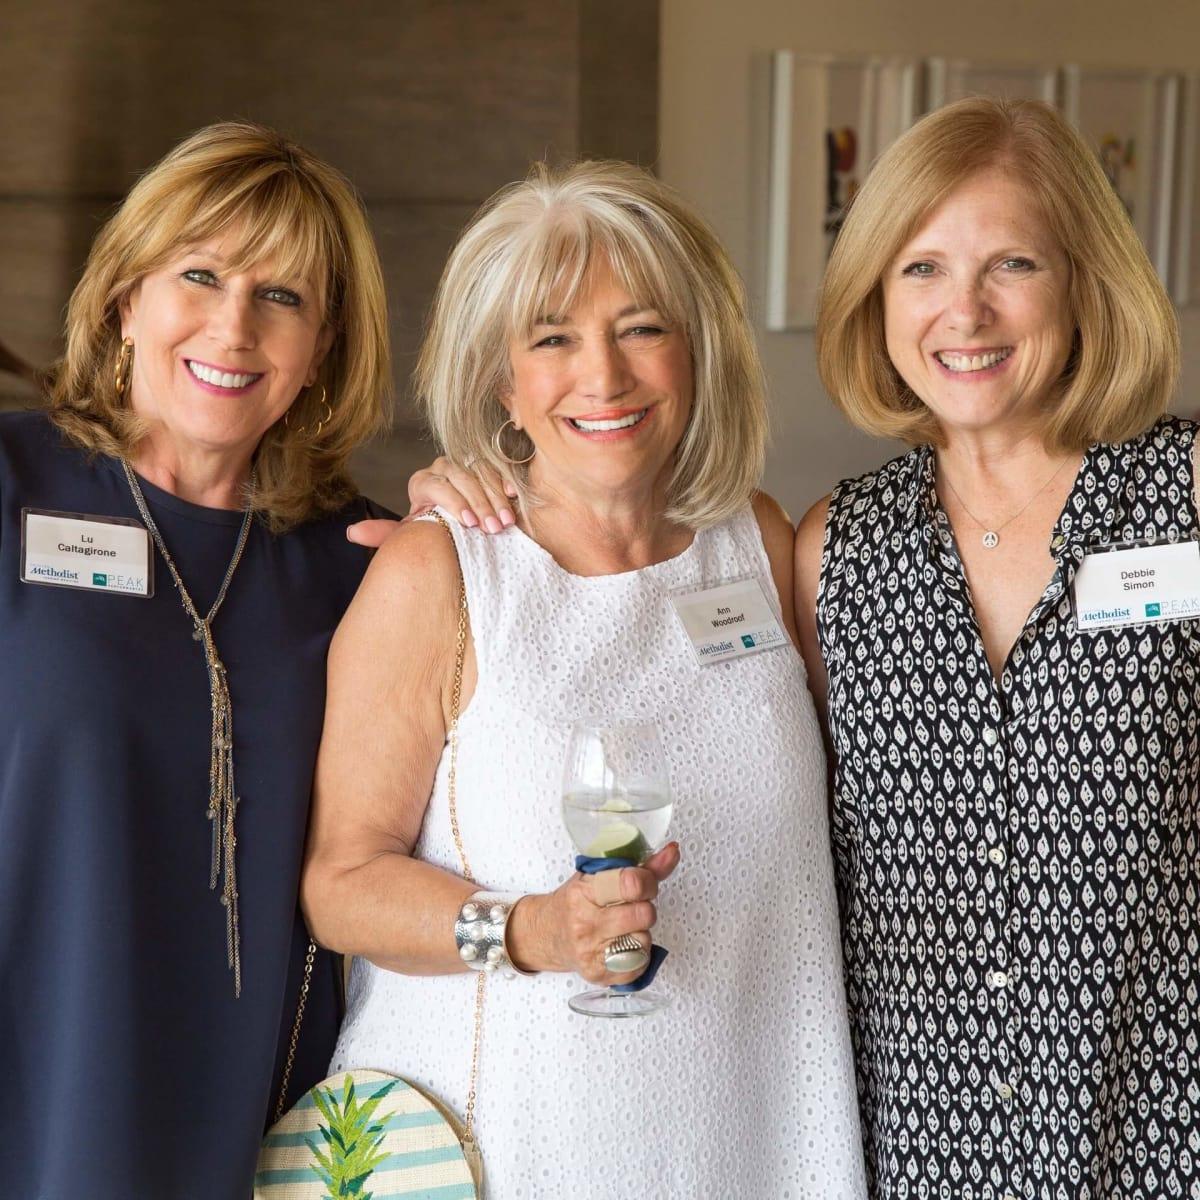 Houston Methodist in Aspen, July 2016, Lu Caltagirone, Ann Woodroof, Debbie Simon